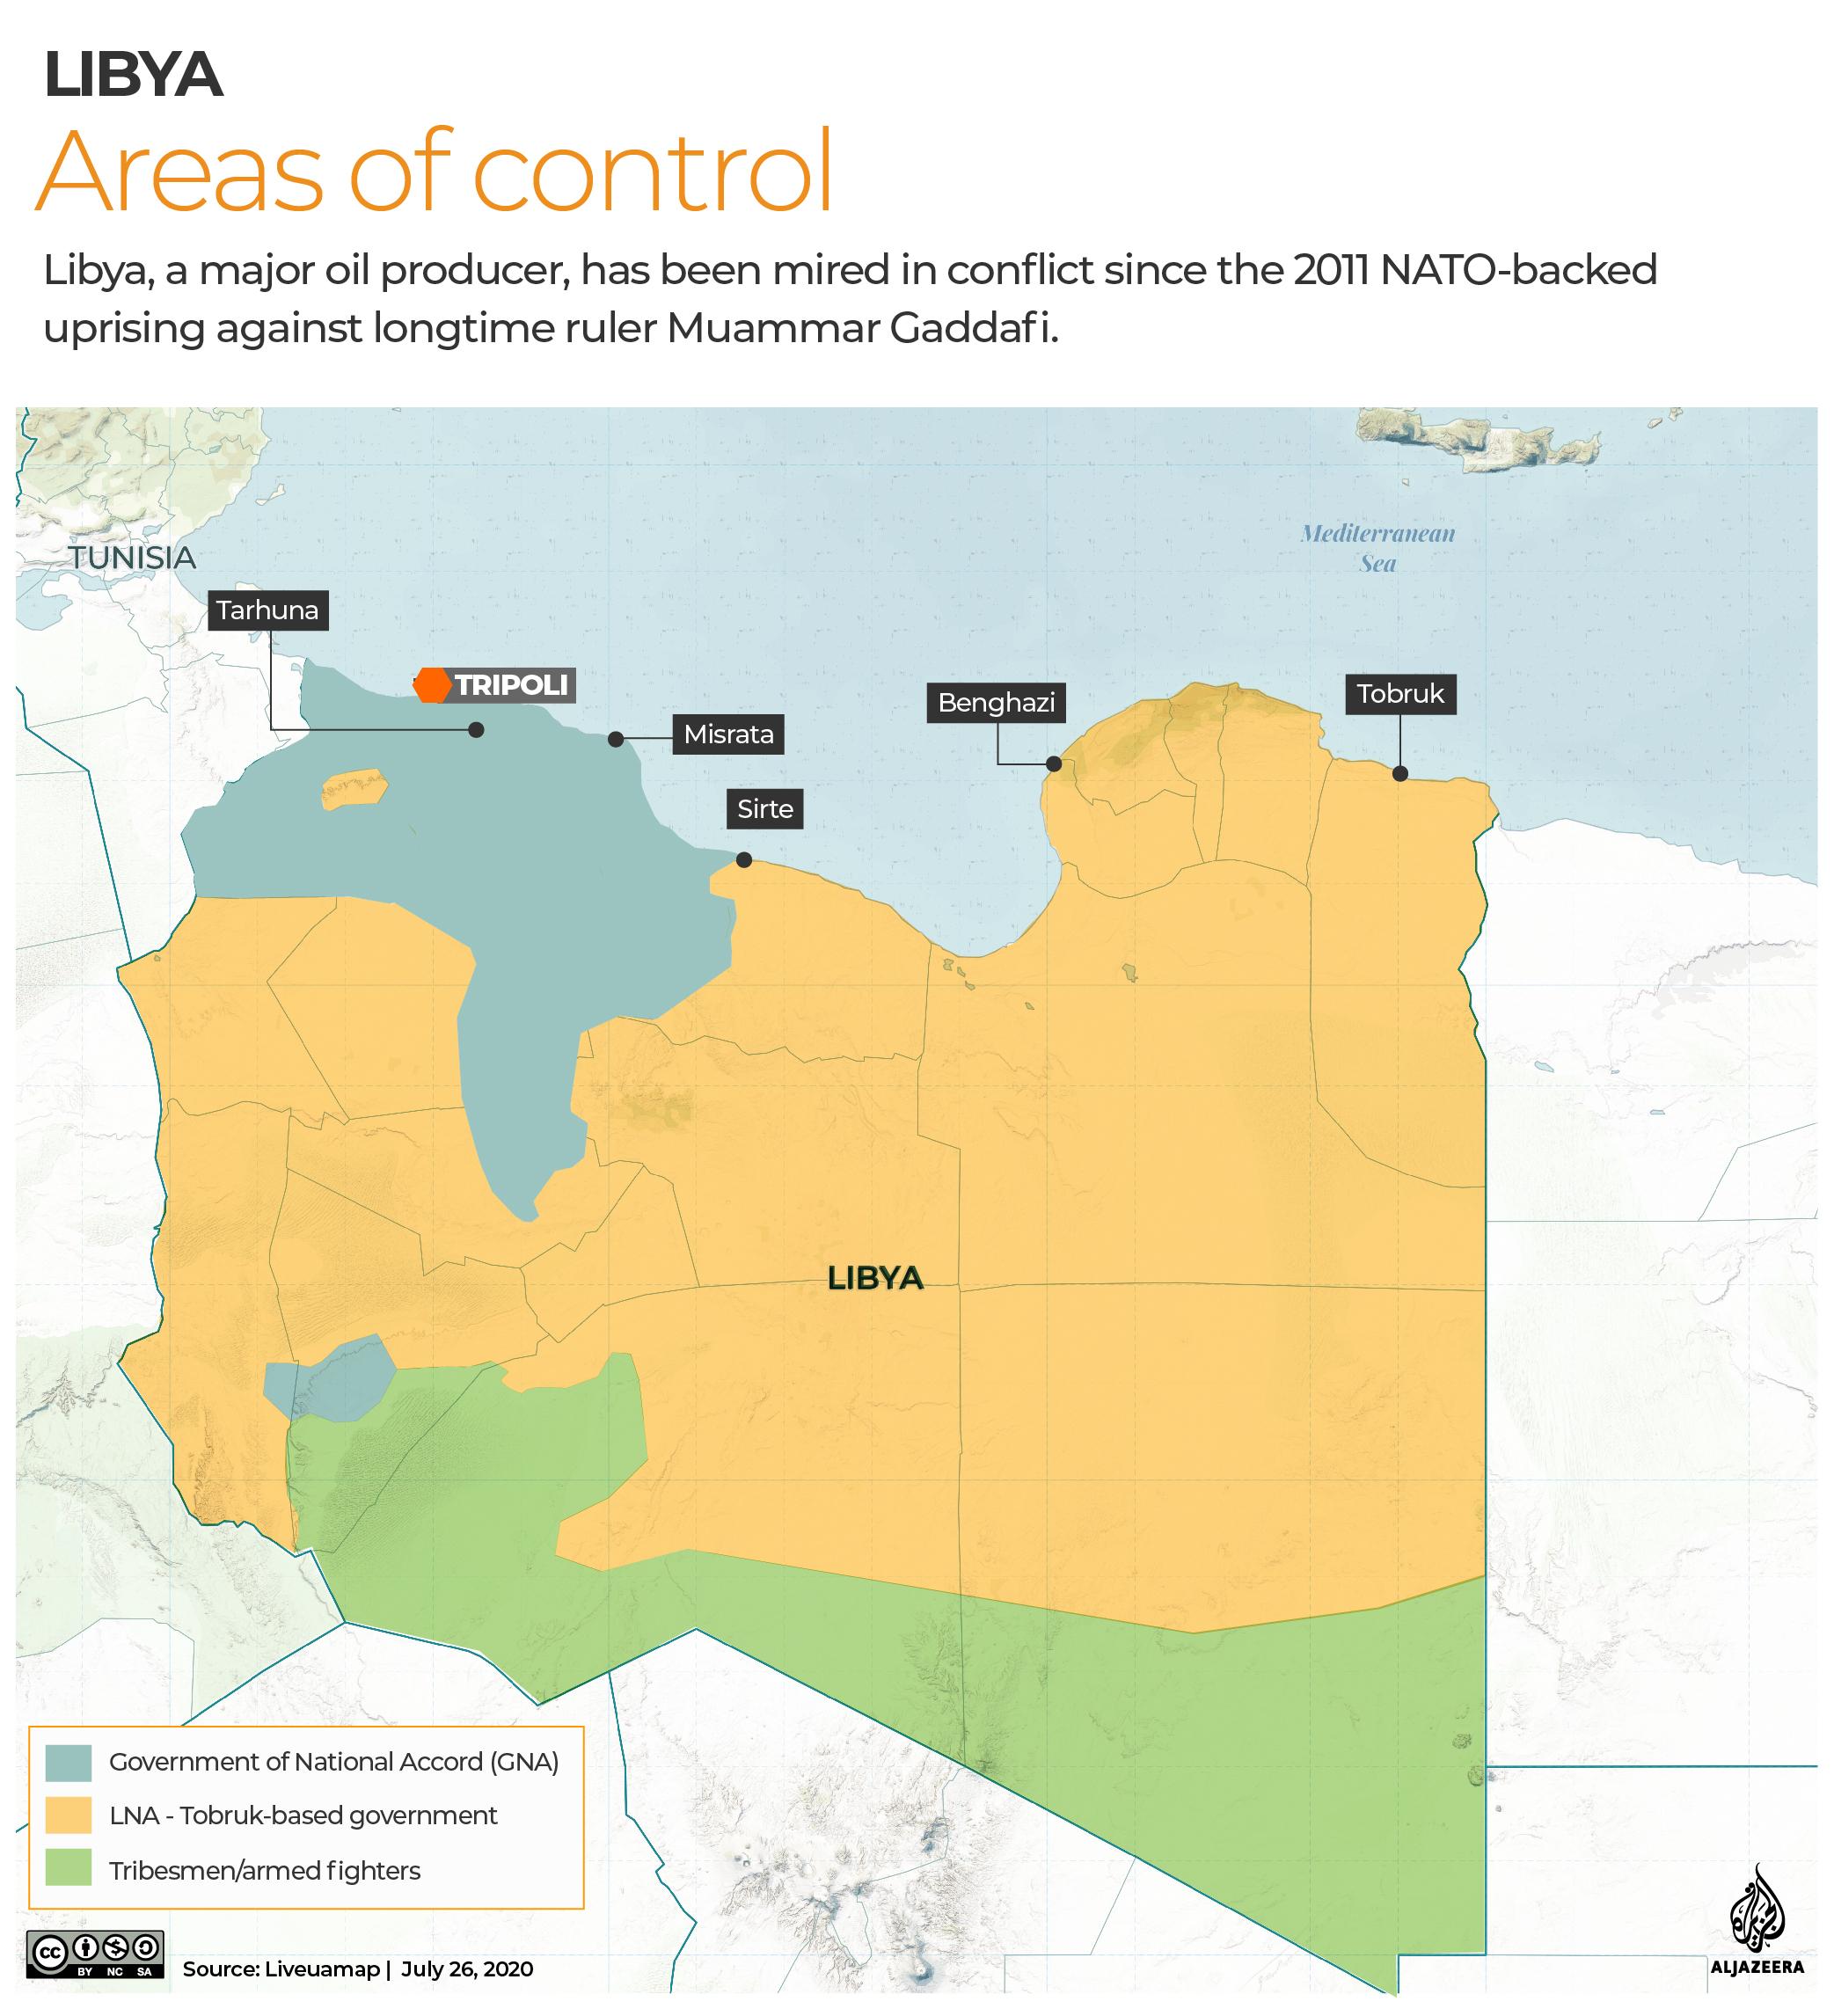 INTERACTIVE: Libya Control map - July 27, 2020